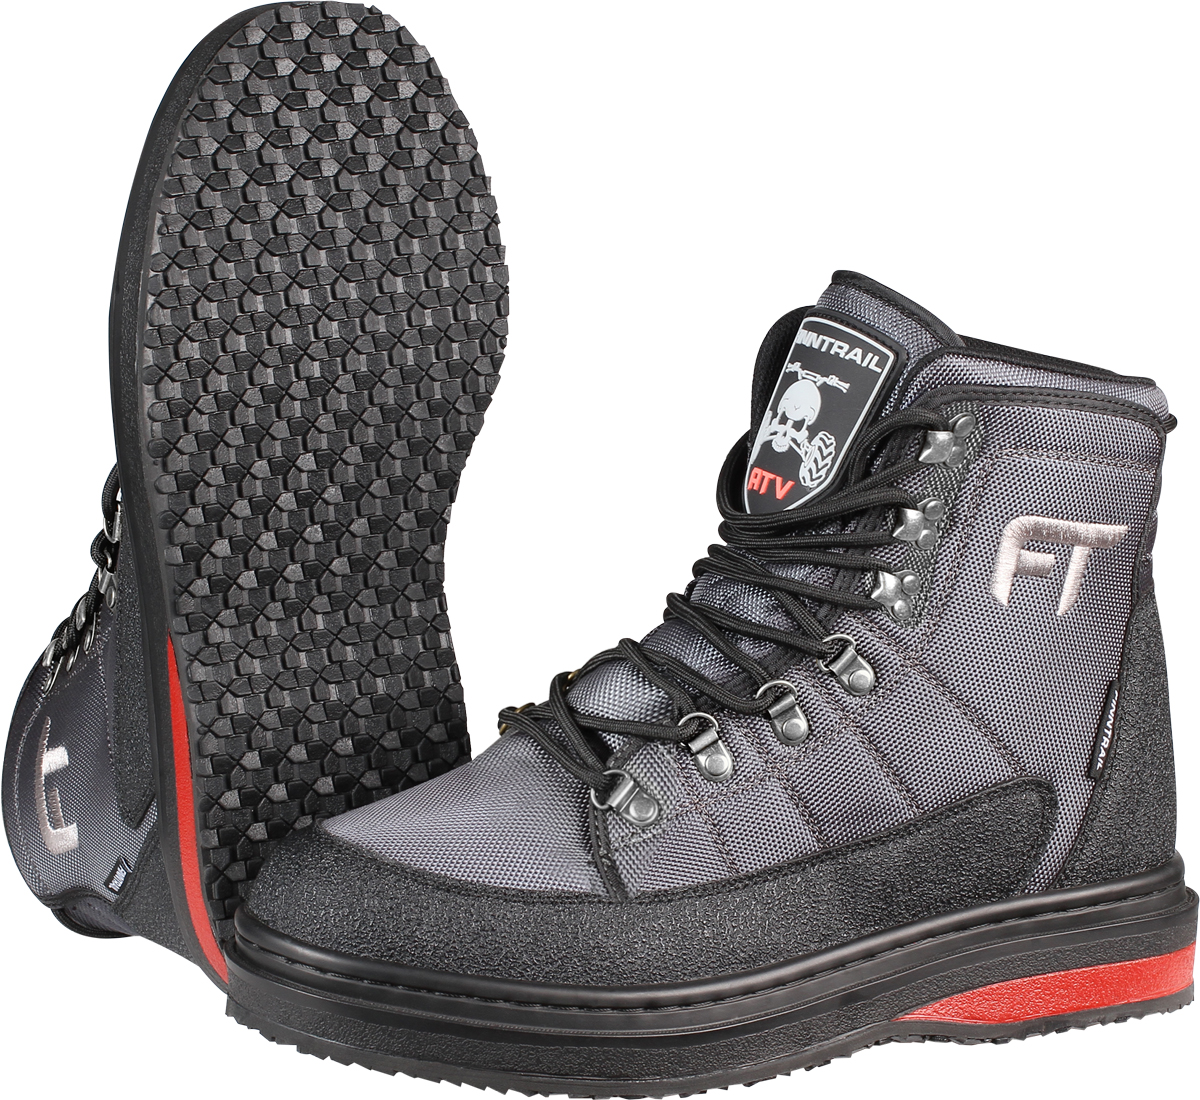 Ботинки для рыбалки Finntrail